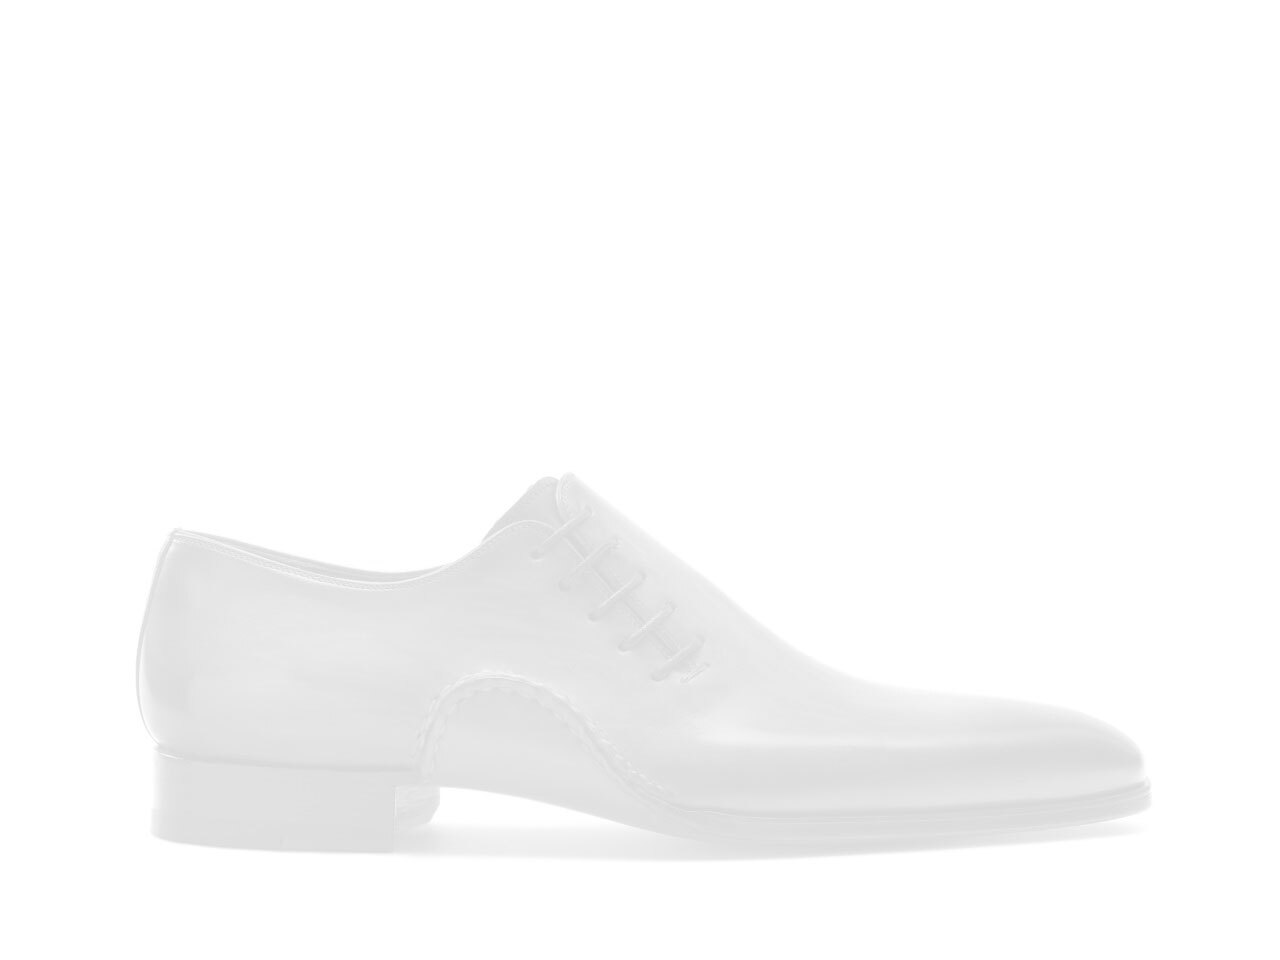 Sole of the Magnanni Allariz Midbrown Men's Sneakers